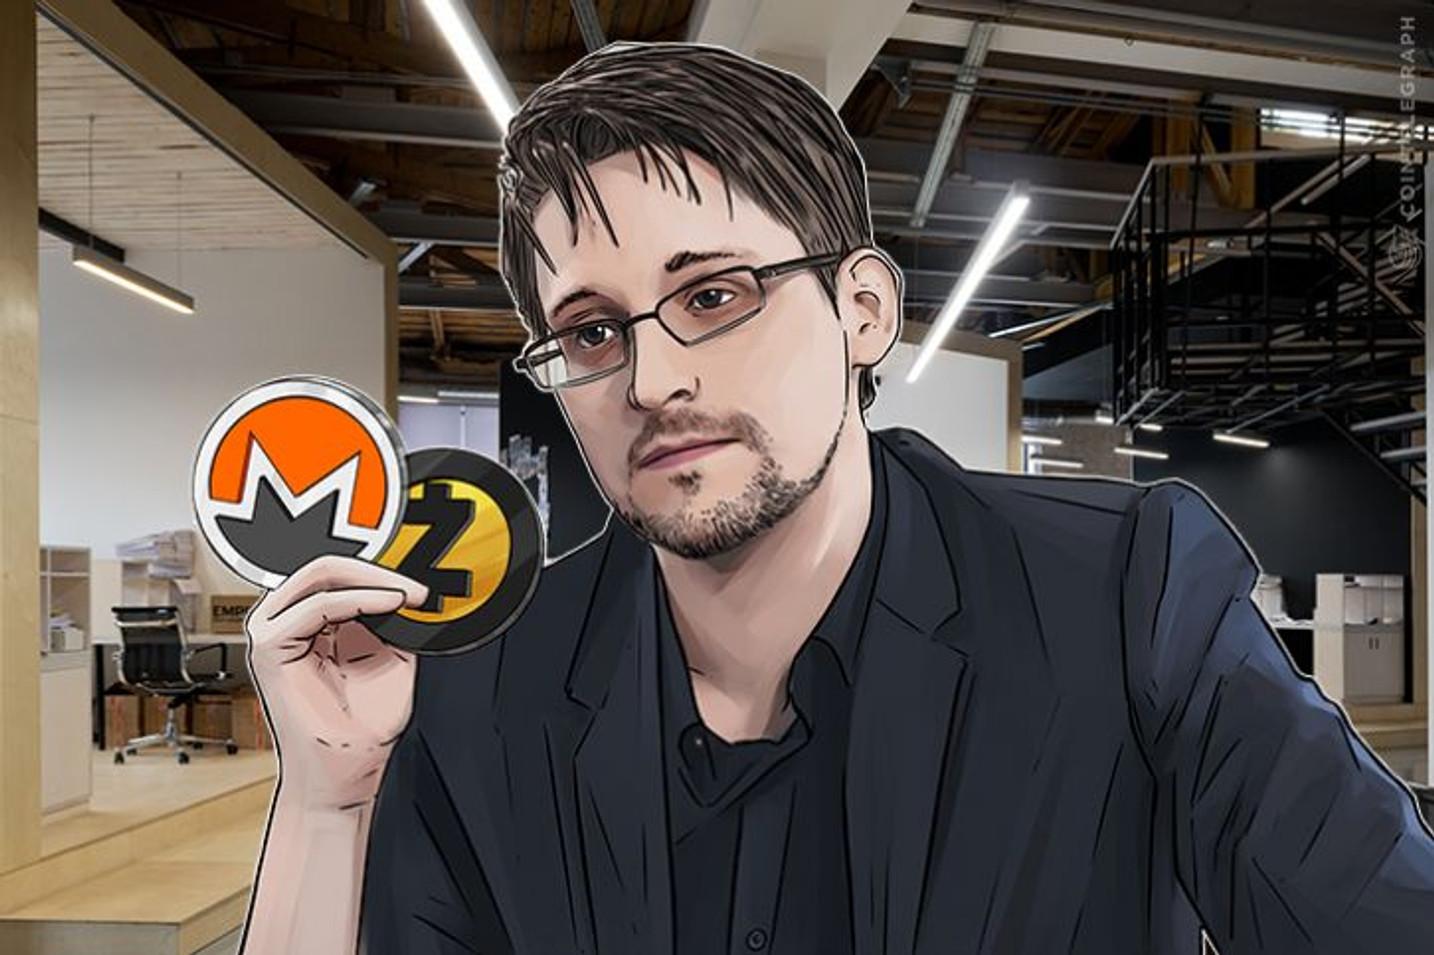 Snowden Venturesの仮想通貨に対する見解